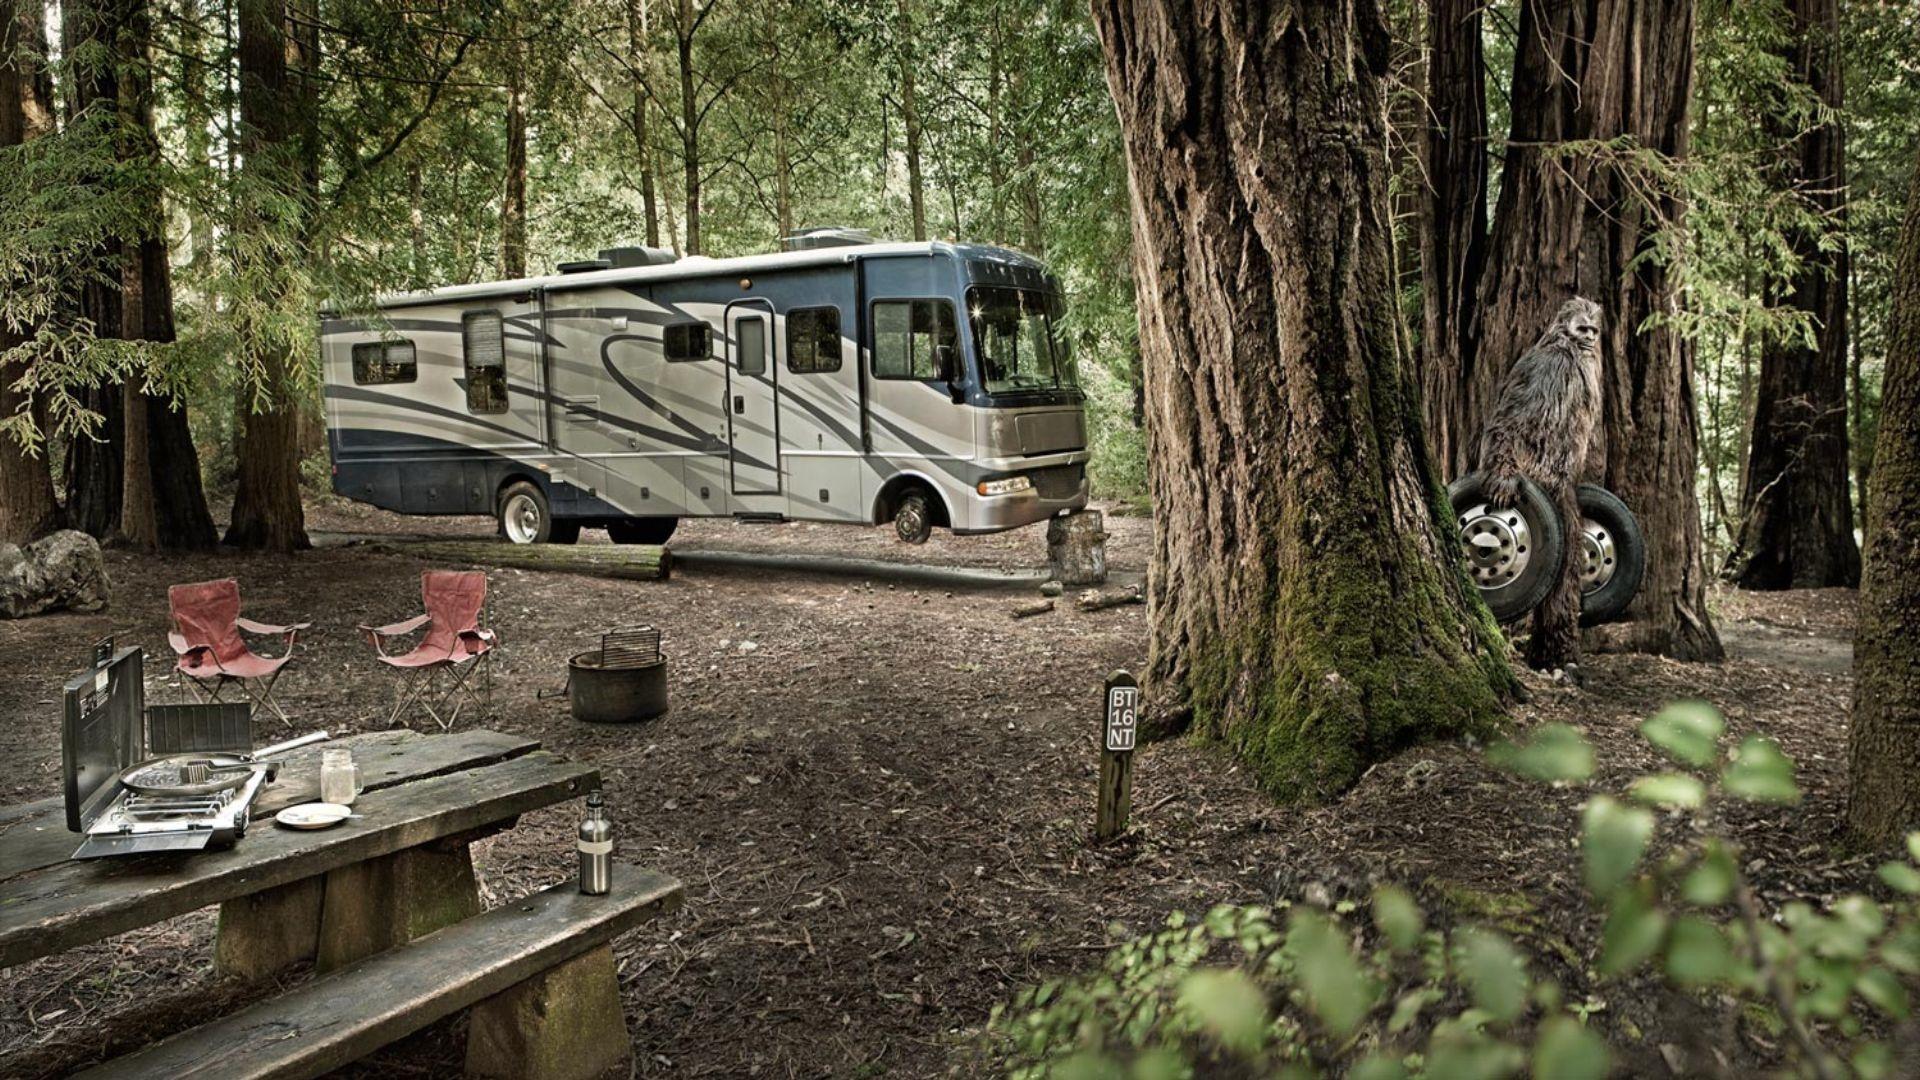 Rv Camping Desktop Wallpapers Top Free Rv Camping Desktop